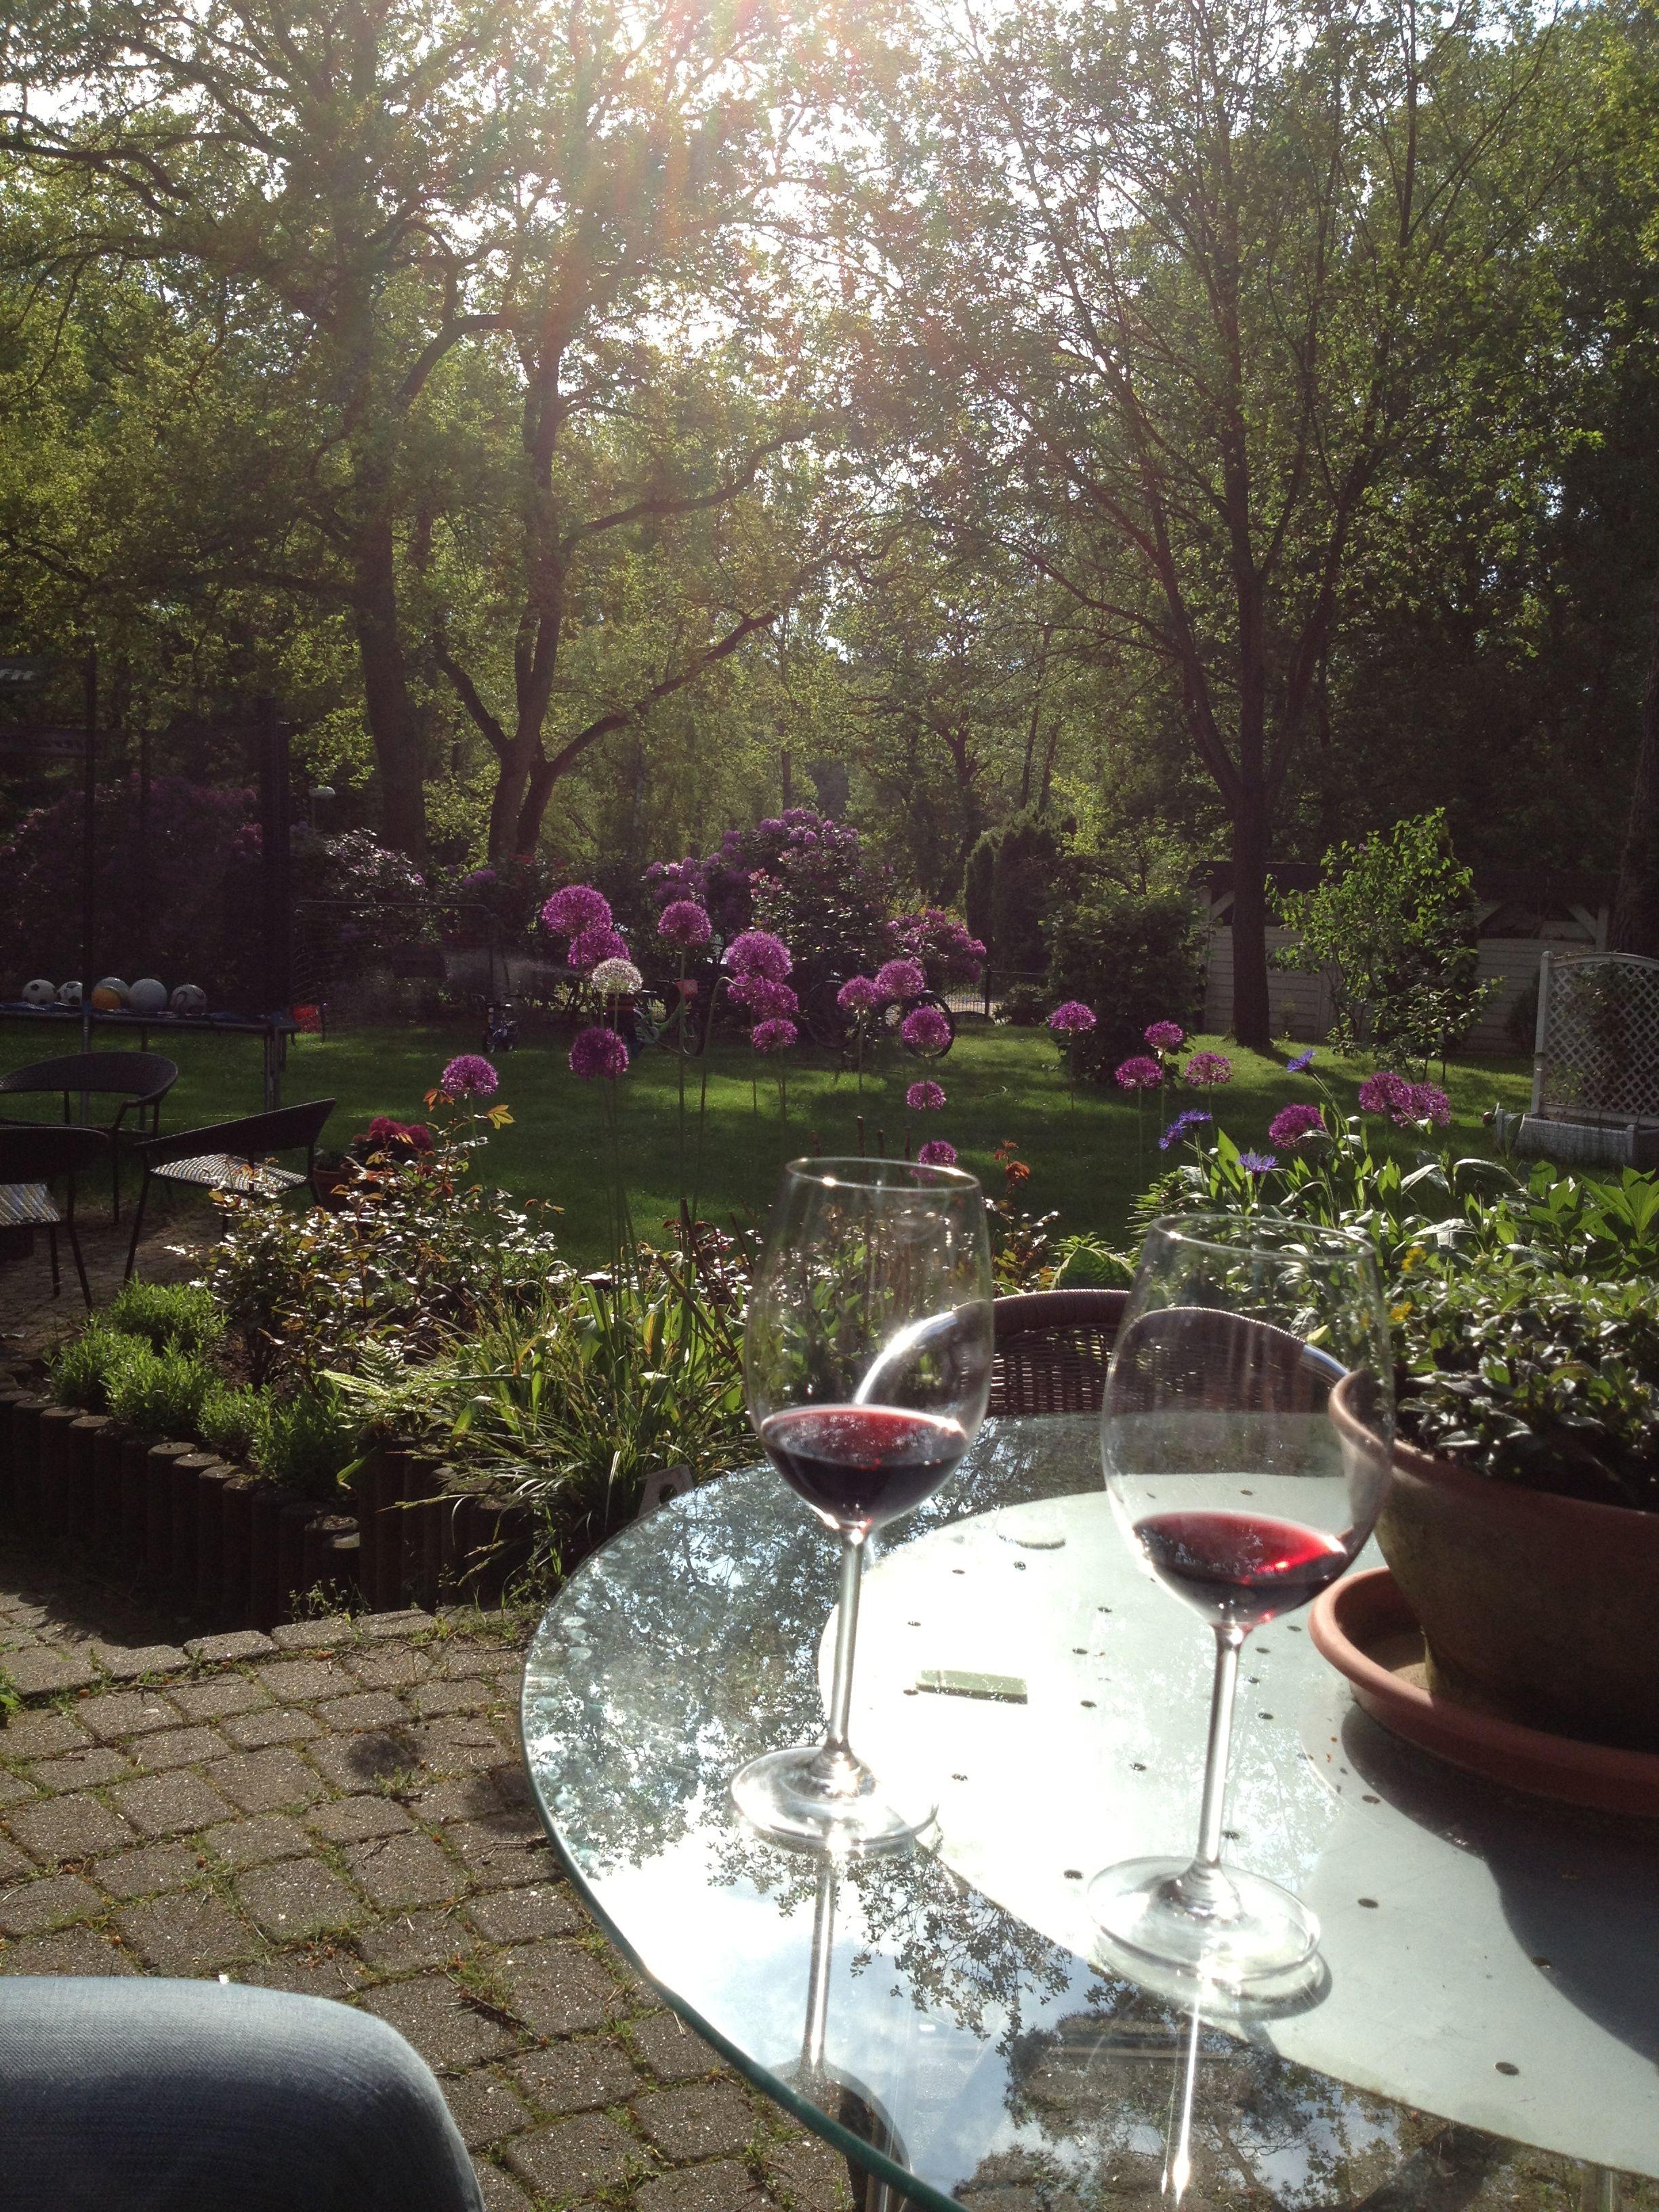 Loving my garden!